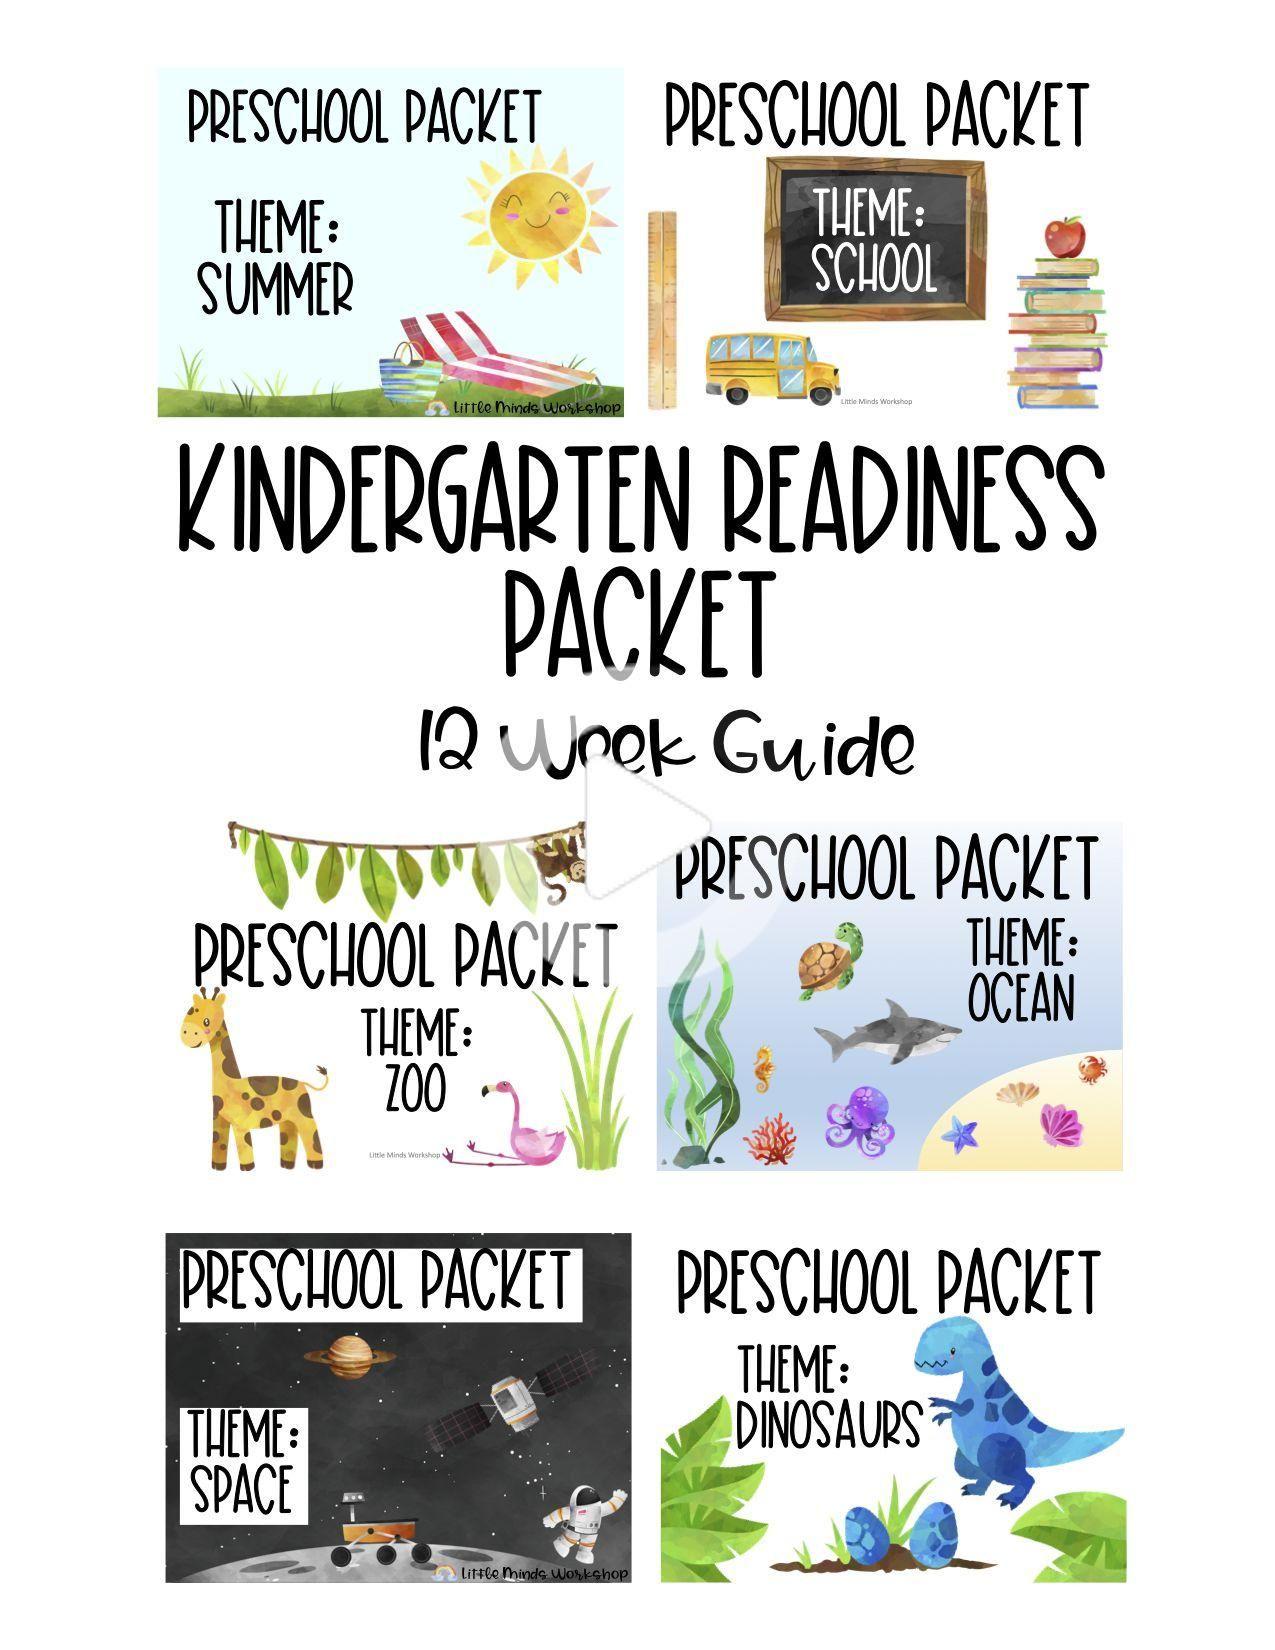 Kindergarten Readiness Packet 12 Week Guide In